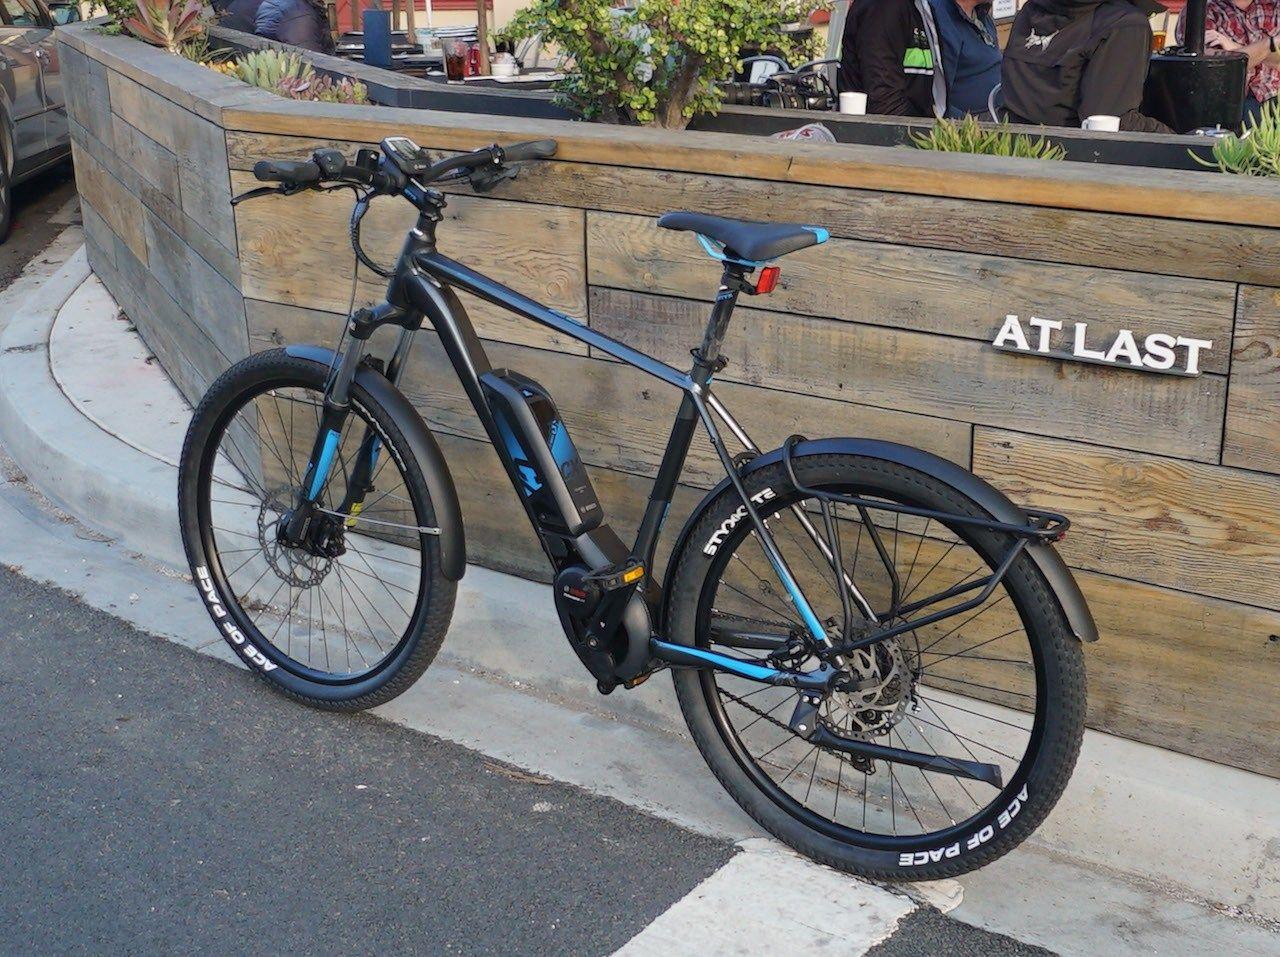 Ebike News New Bulls La Expo Ebike Incentives Emtb Coaching More Videos Electric Bike Report Electric Bike Ebikes Electric Bicycles E Bike Rev Electric Bicycle Electric Bike Bike News